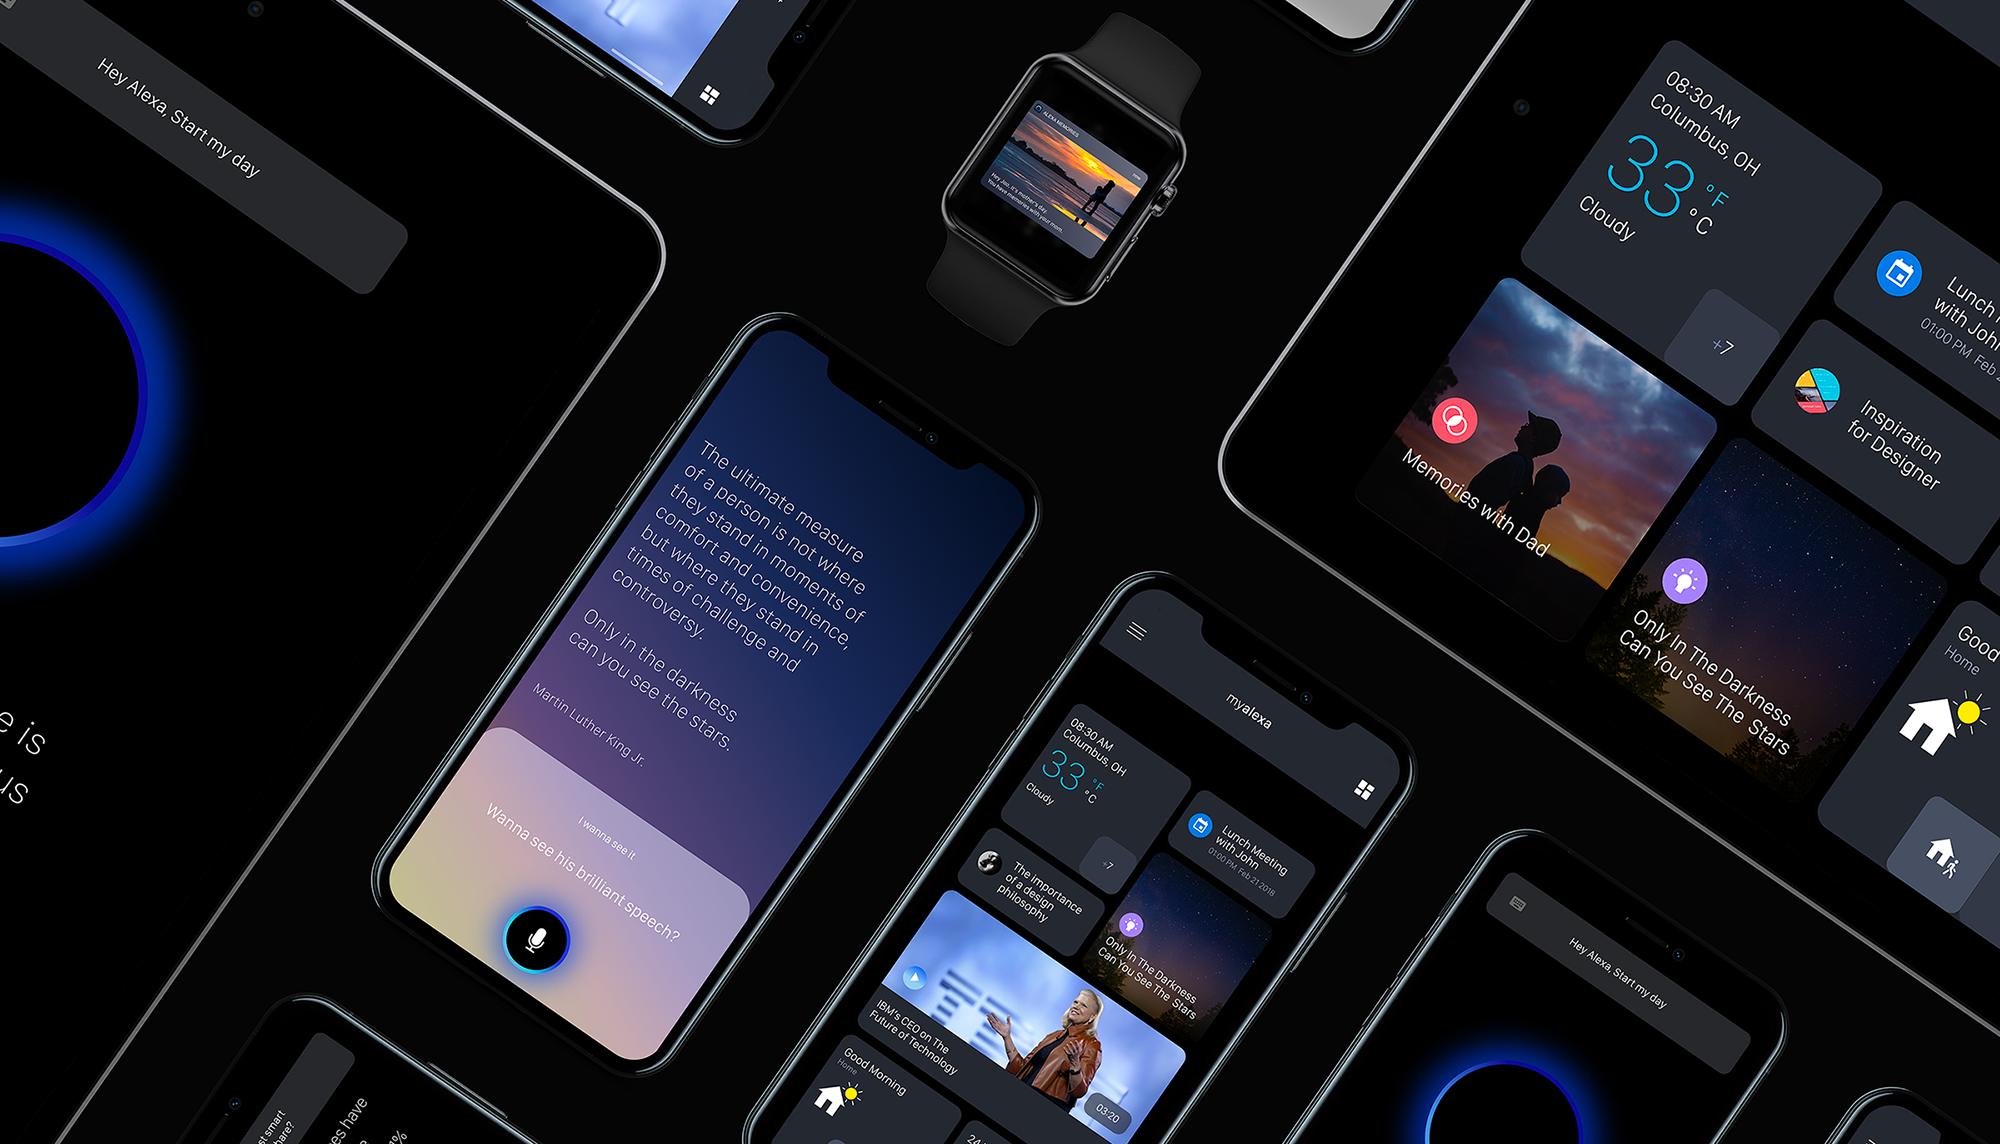 UI/UX & Interaction Design: Amazon Alexa App Concept